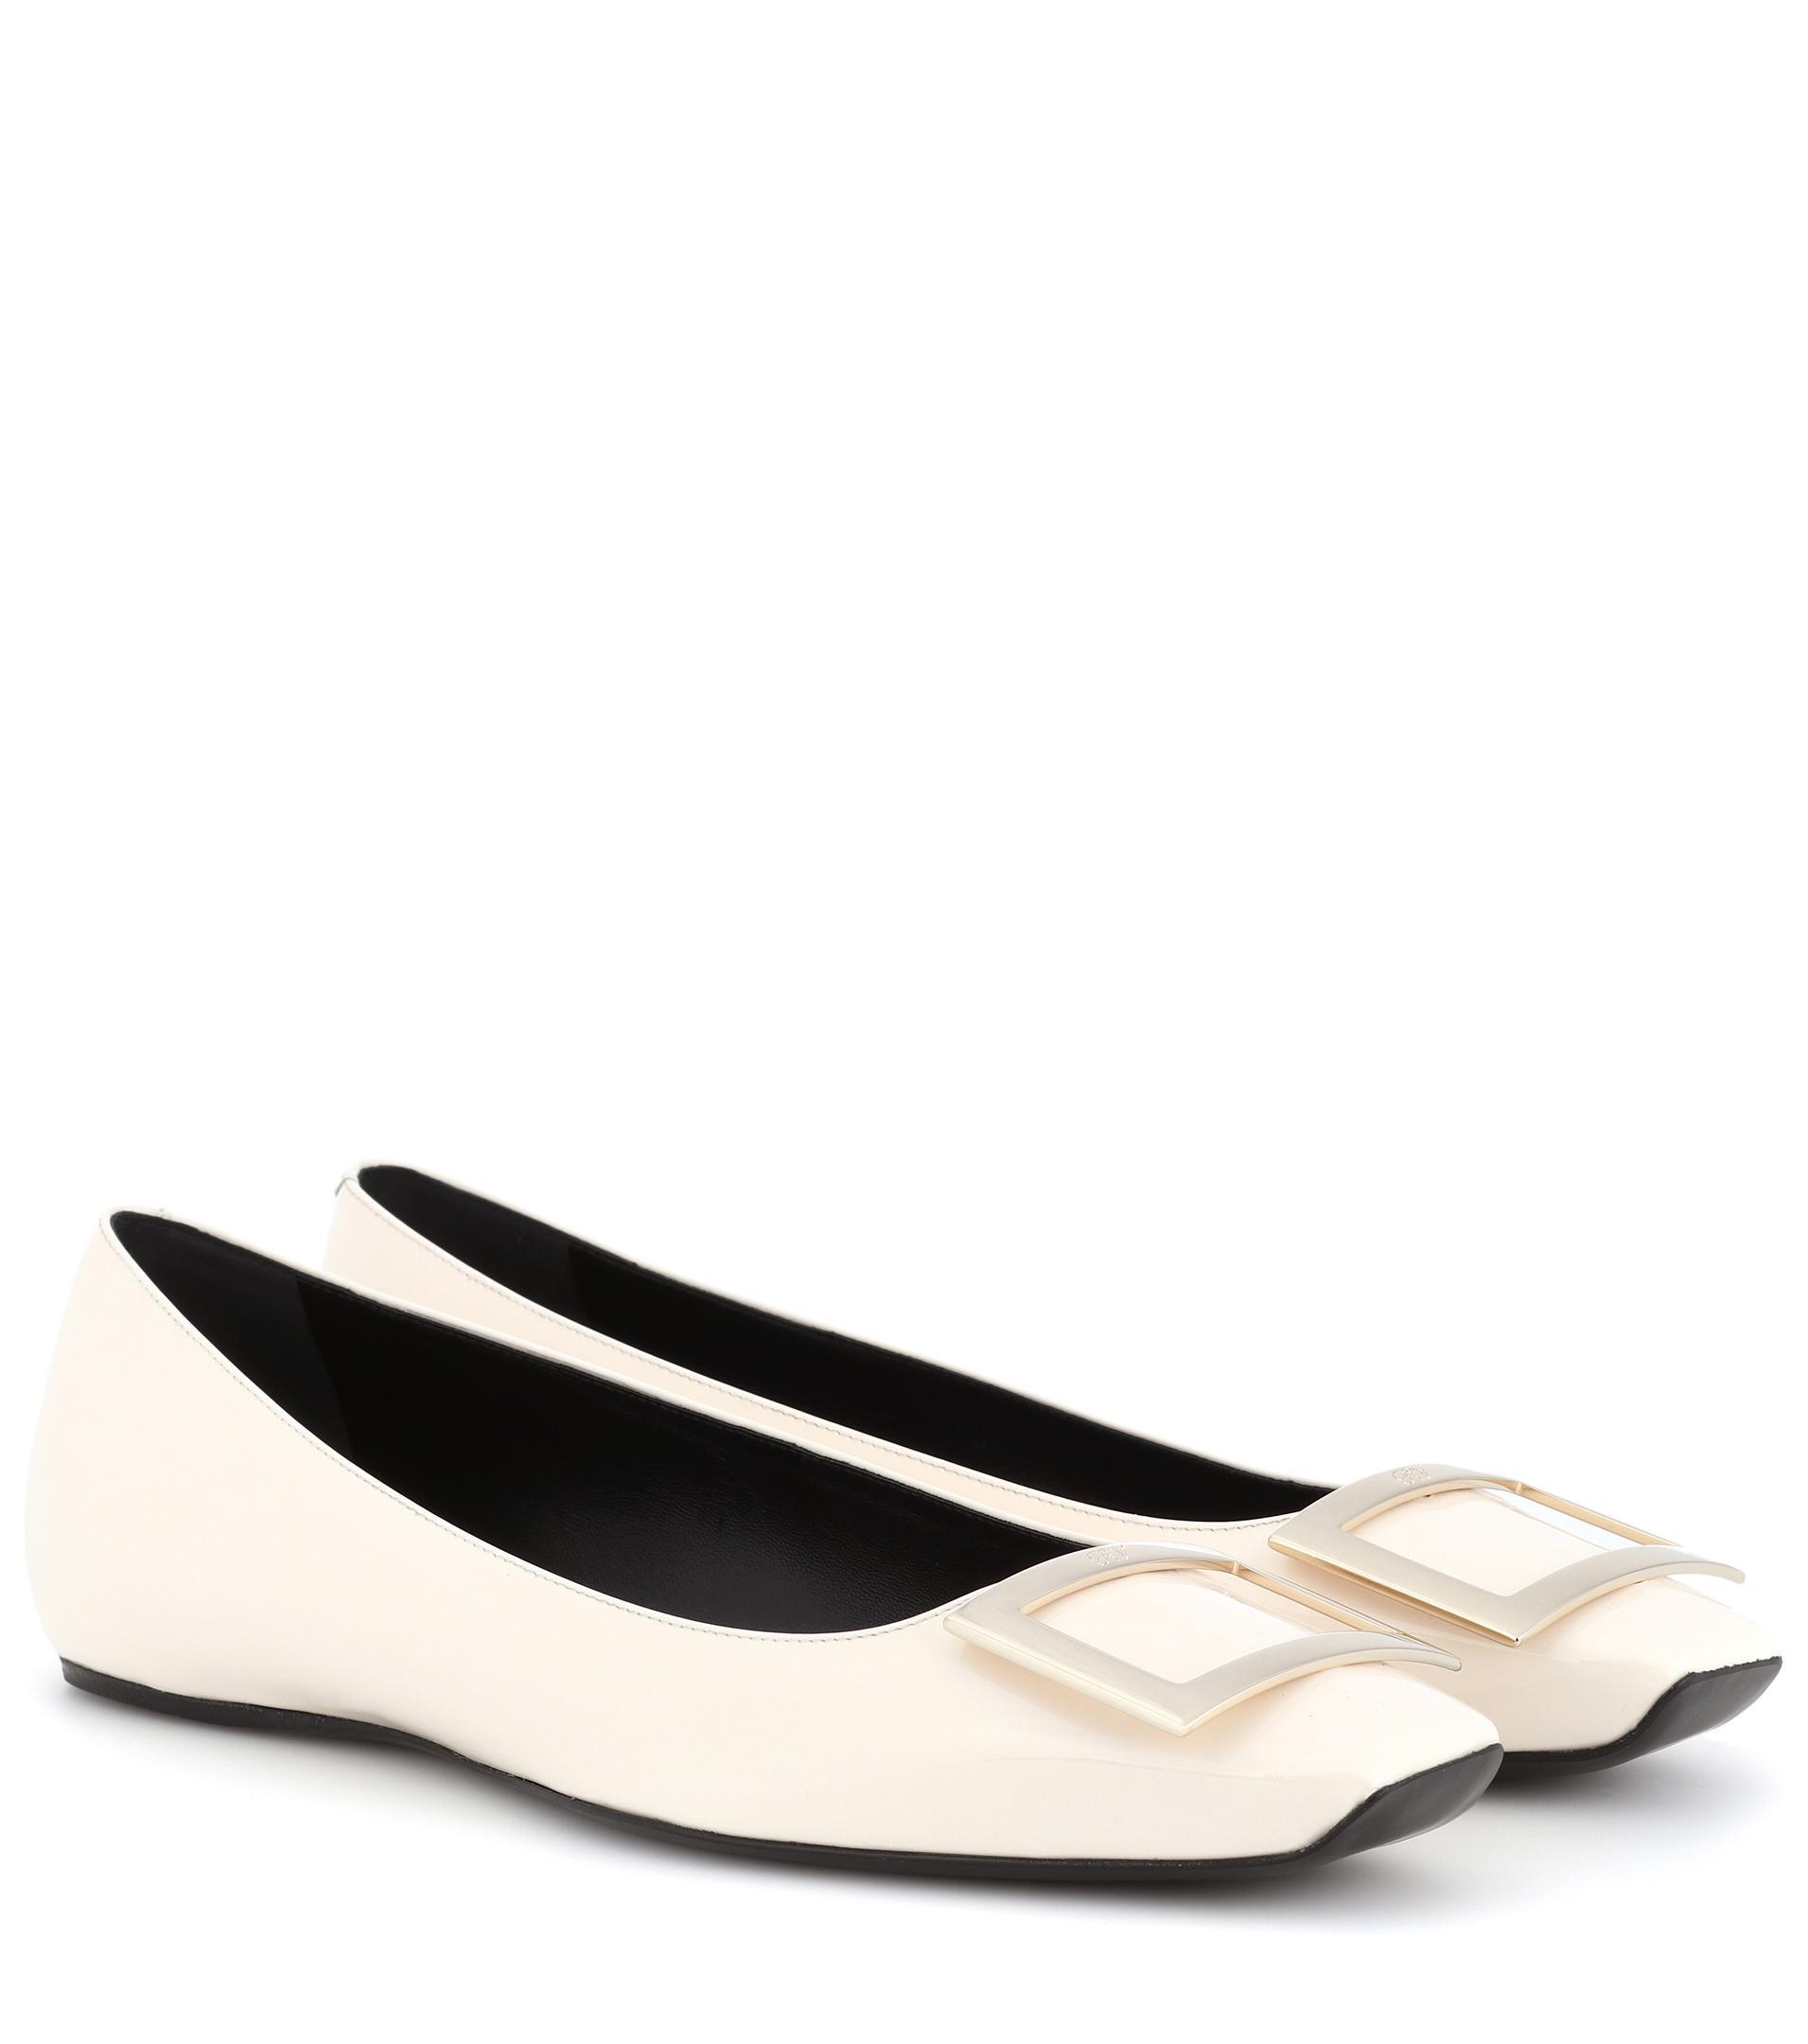 Roger Vivier. Women's White Trompette Patent Leather Ballerinas